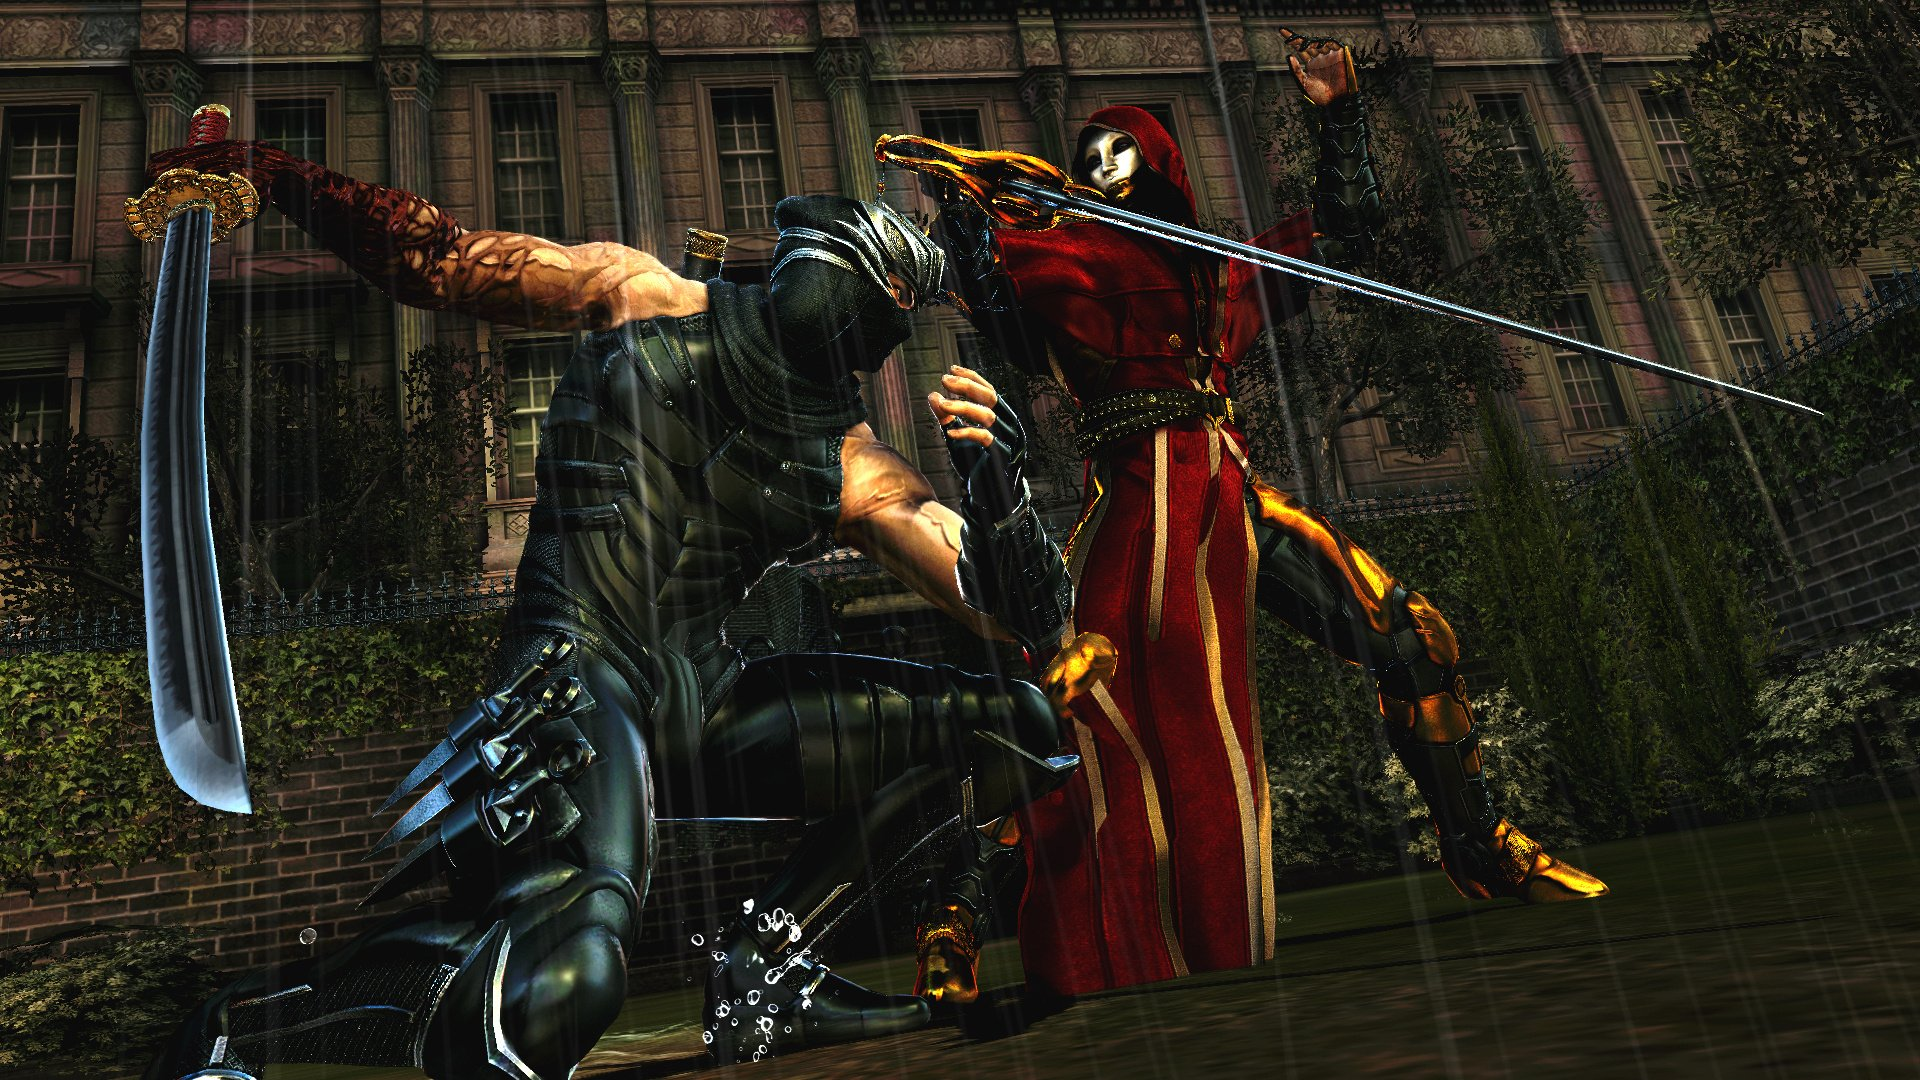 ninja gaiden iii review (ps3) | push square